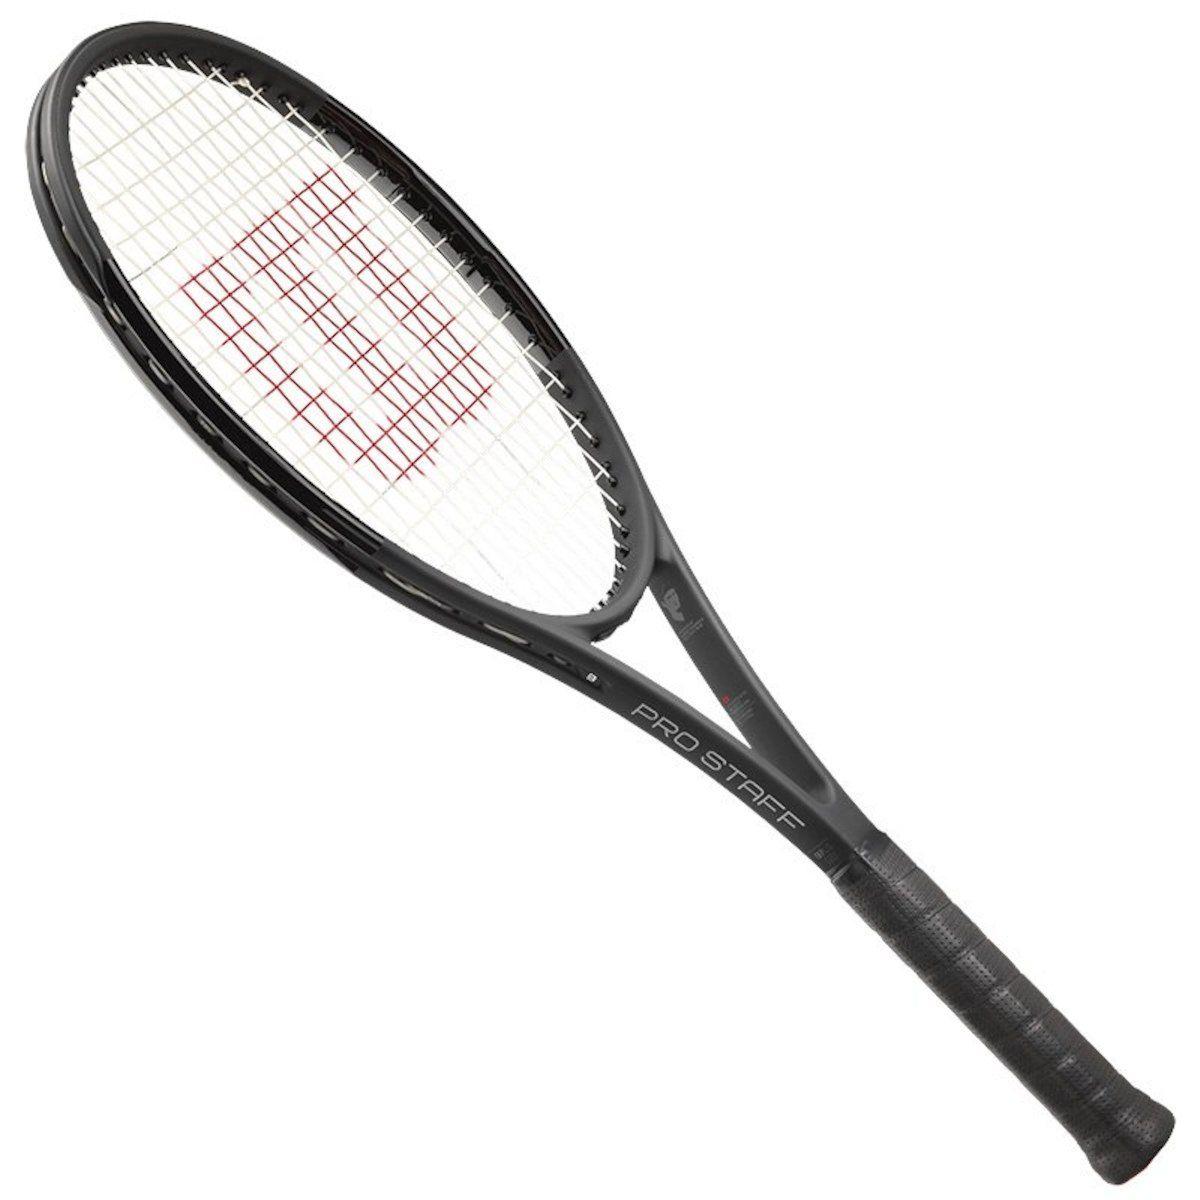 Raquete de Tênis Wilson Pro Staff 97 Ls - Black